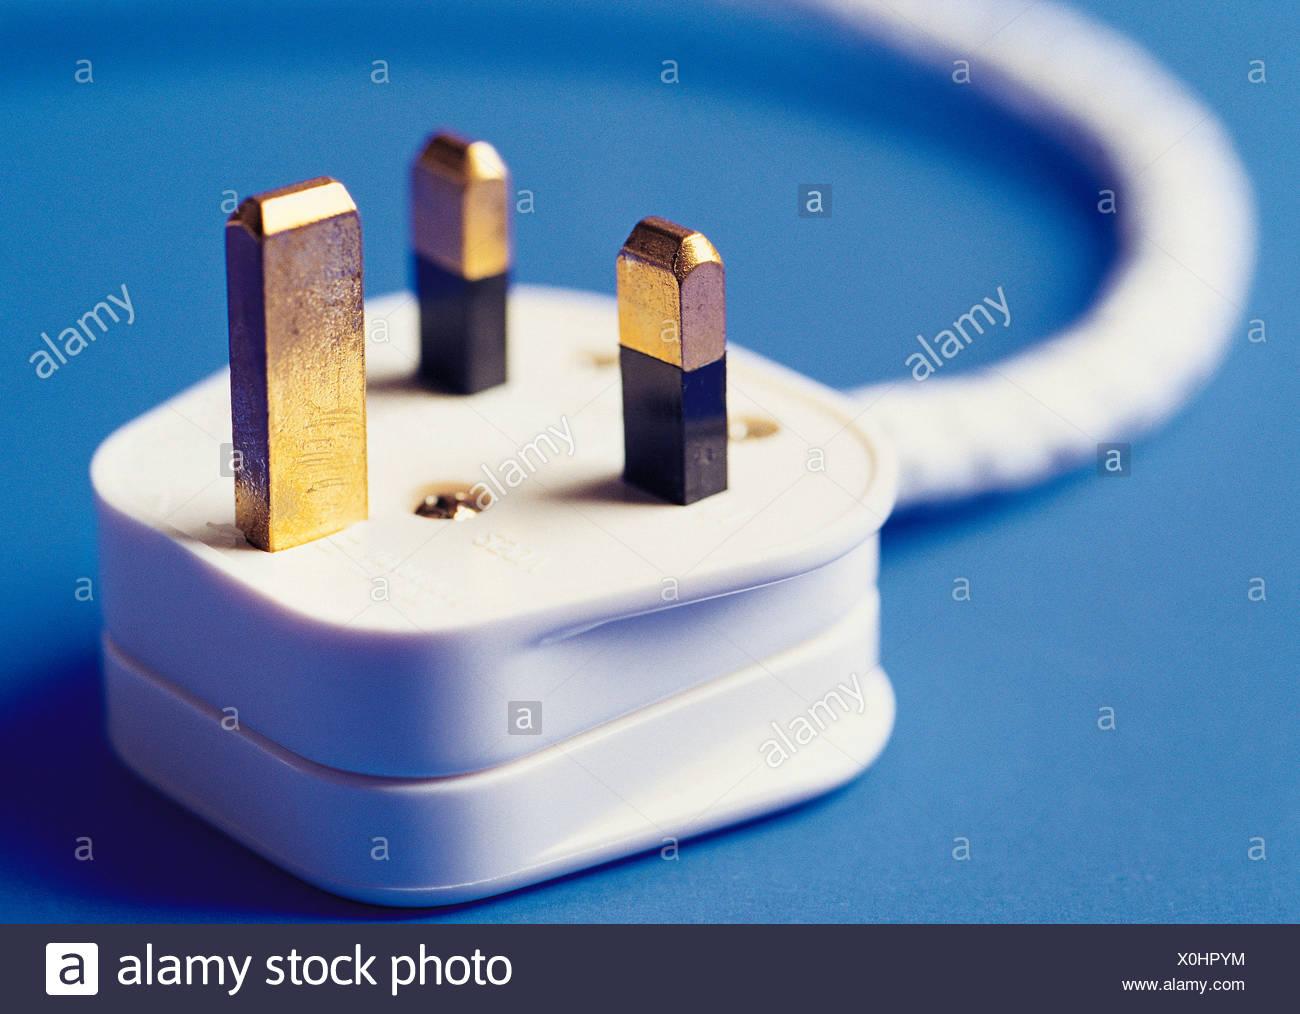 13 Amp Plug Stock Photos & 13 Amp Plug Stock Images - Alamy